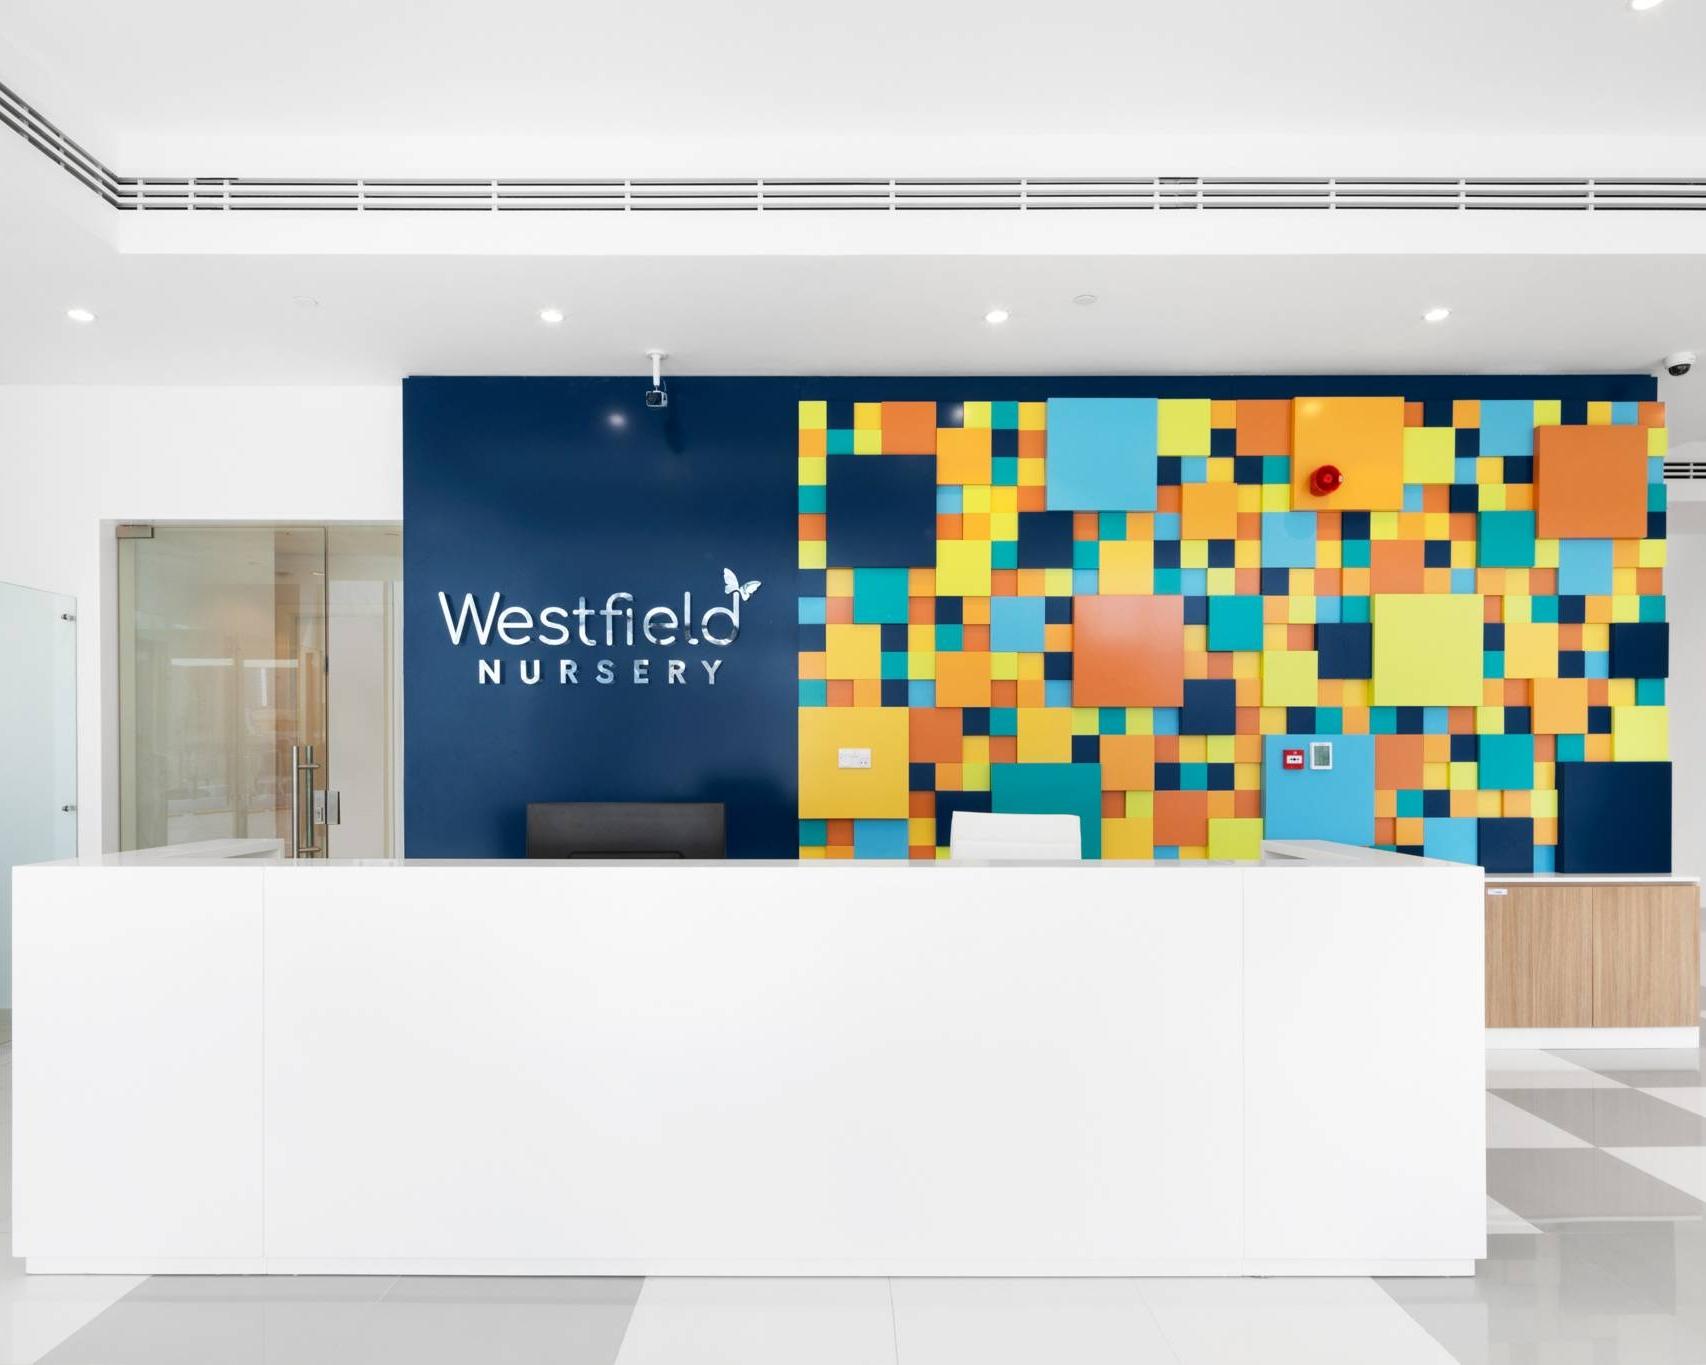 Westfield Nursery, Near City Walk, Dubai